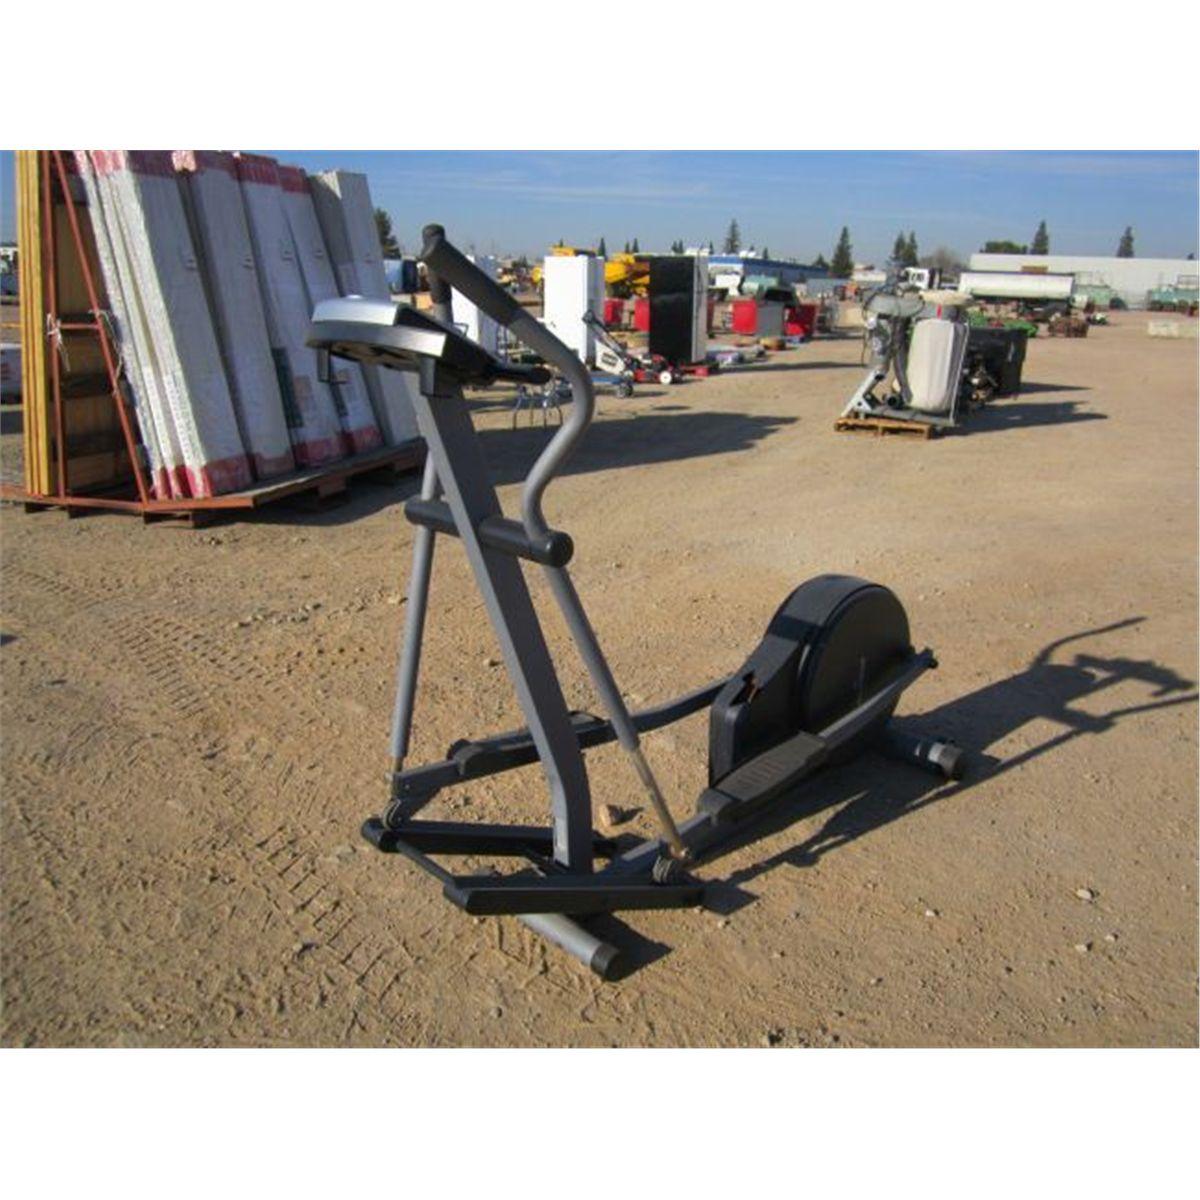 Nordictrack cx 985 elliptical machine price 10000, bsa